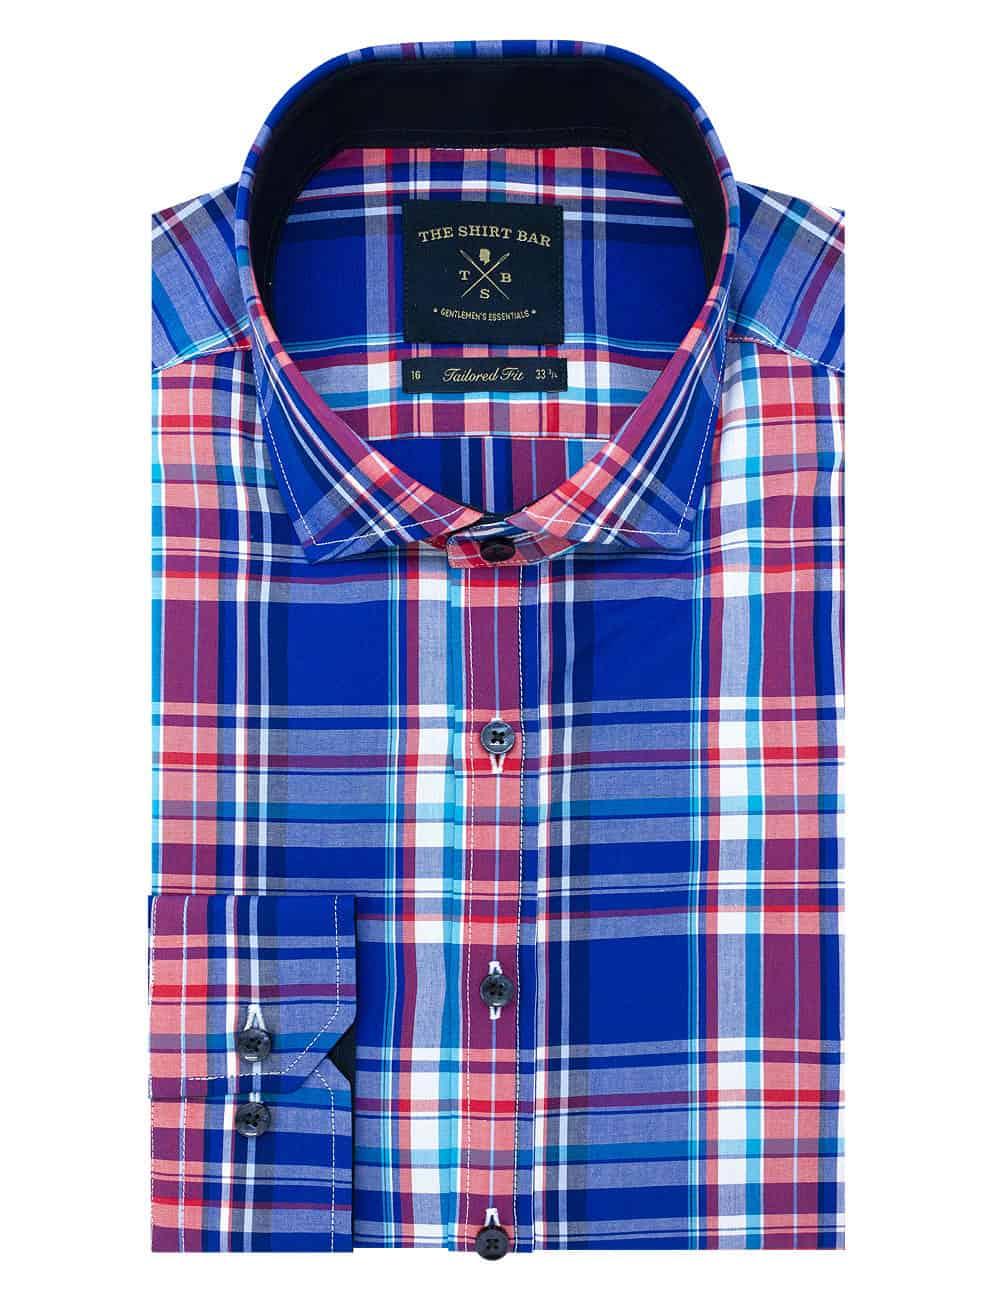 TF Multi Coloured Checks 100% Premium Cotton Long Sleeve Single Cuff Shirt TF1A17.6